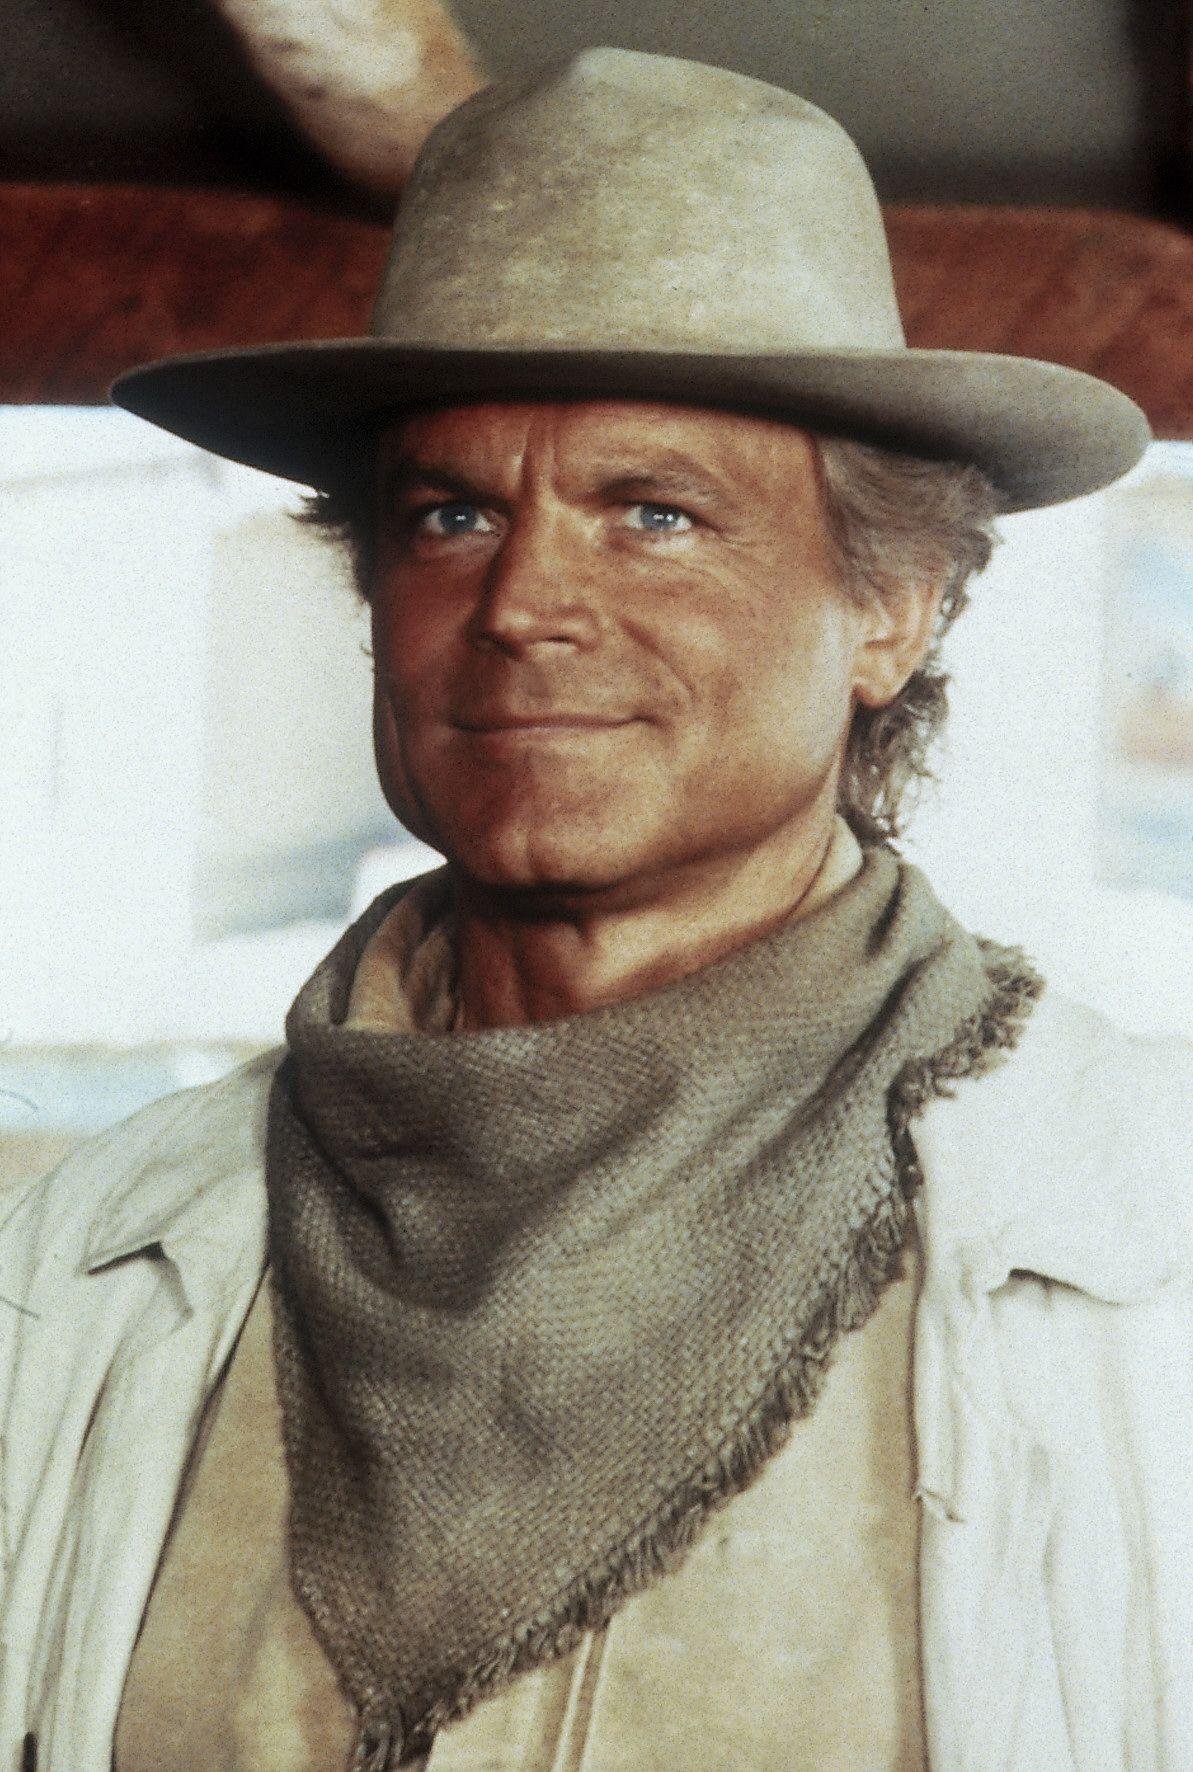 Terence Hill Nee Mario Girotti Born 03 29 1939 Italian